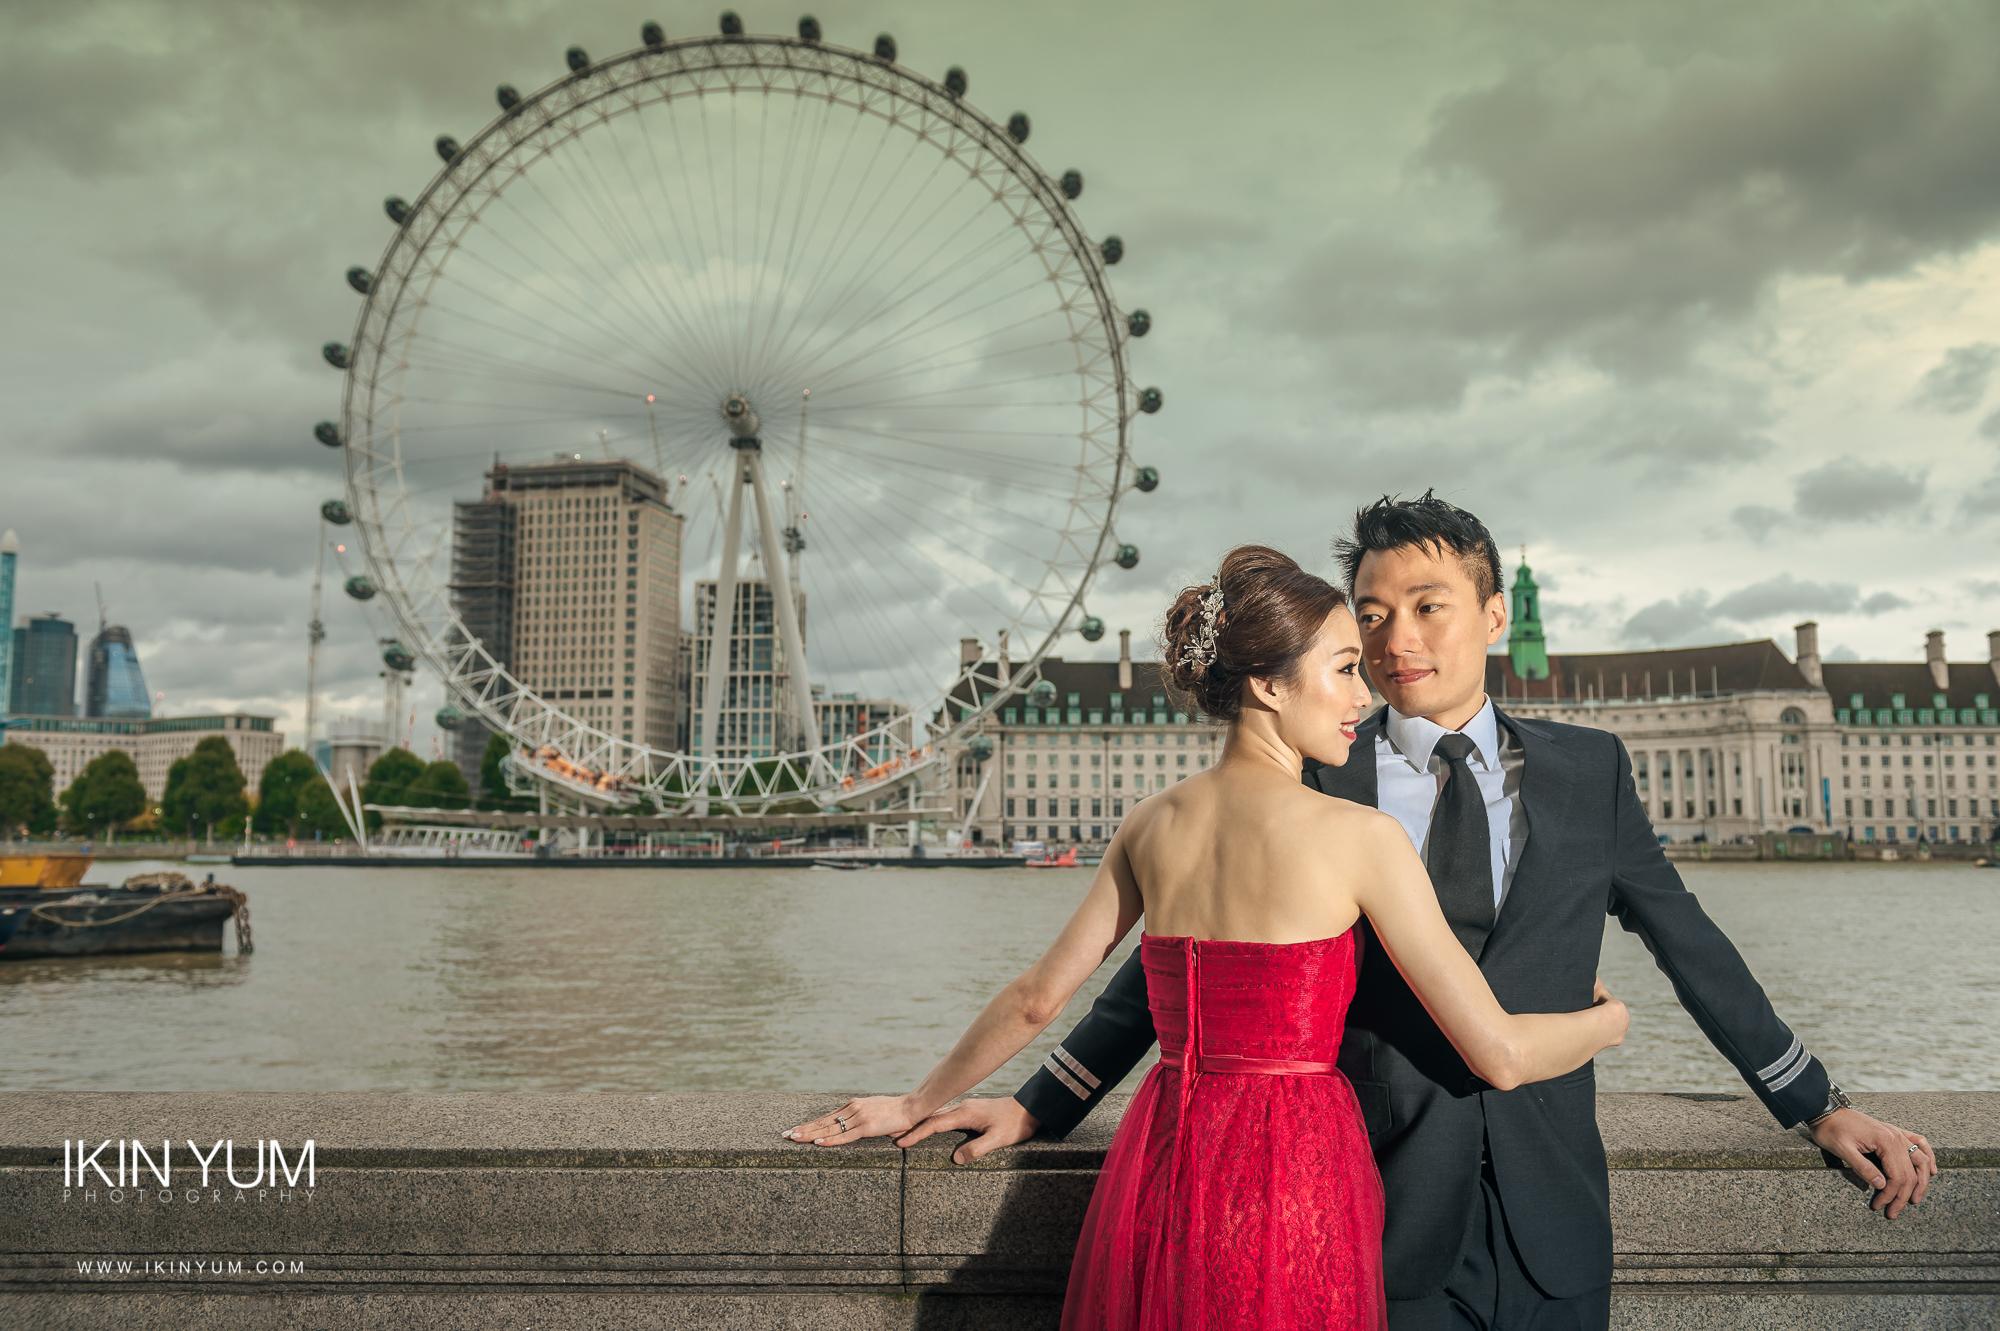 Yannis & Kenny Pre-Wedding Shoot - Ikin Yum Photography-0118.jpg